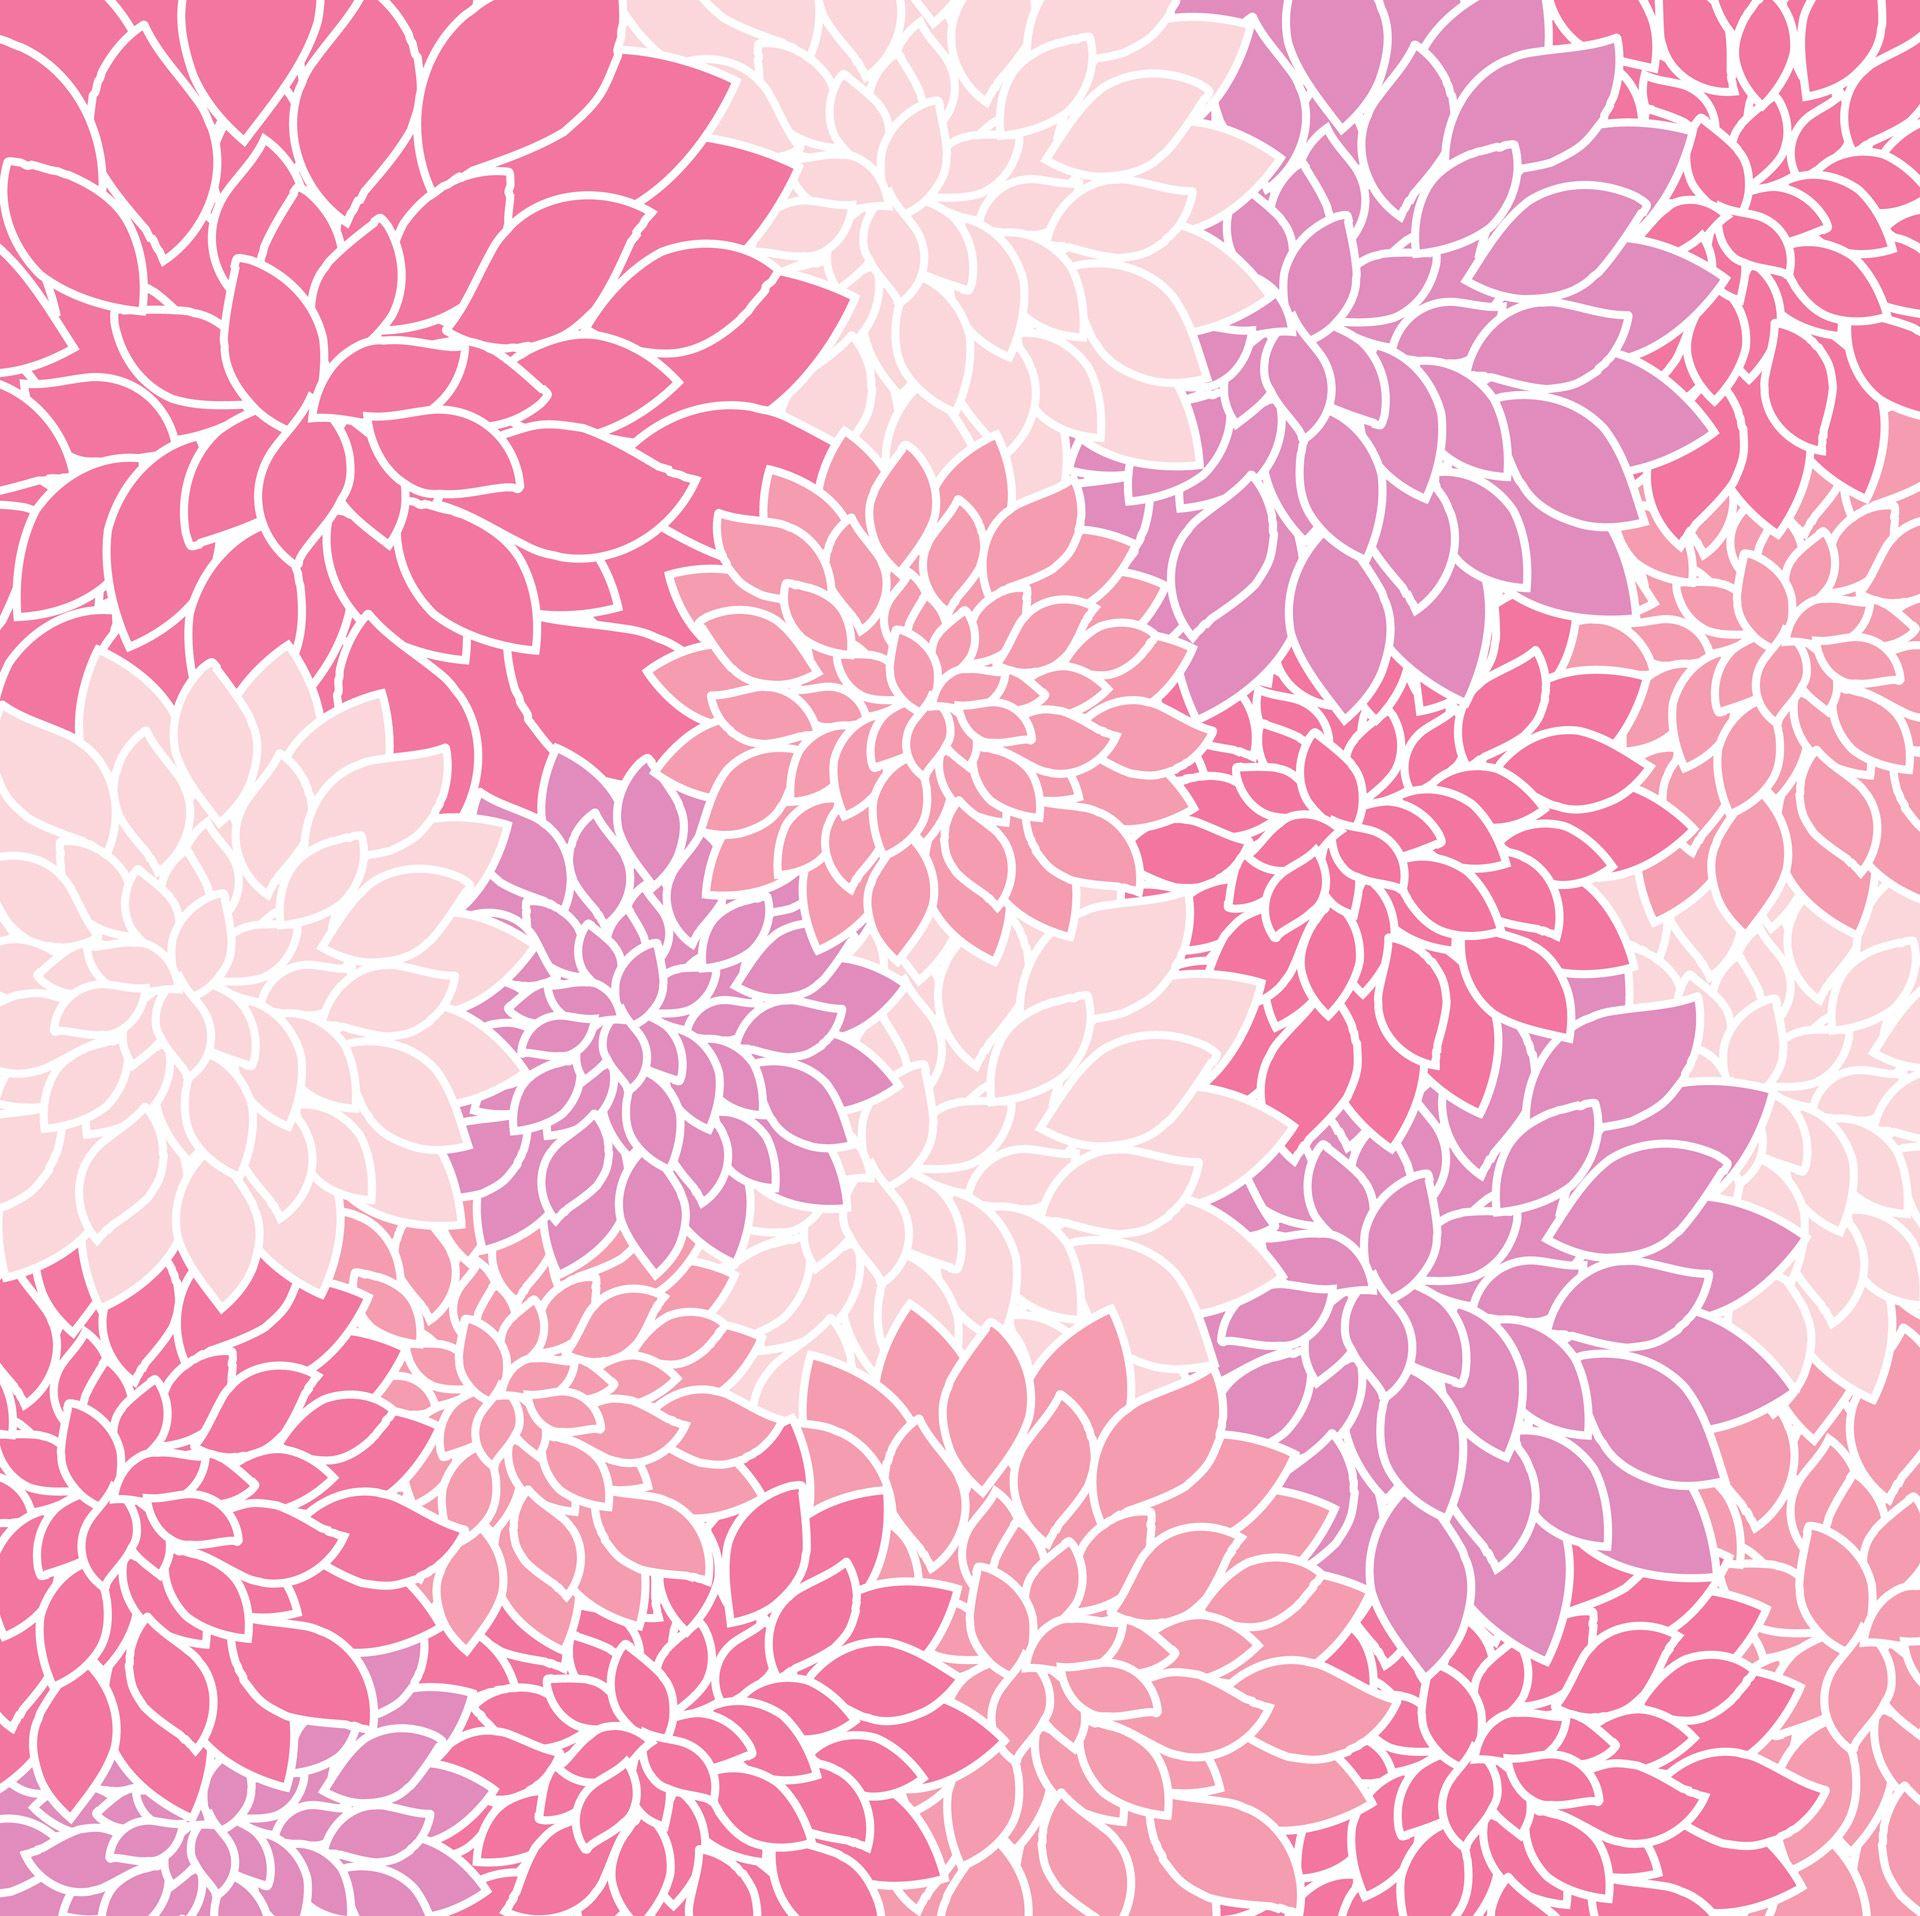 Vintage Floral Wallpaper Background Free Stock Photo 花柄の壁紙